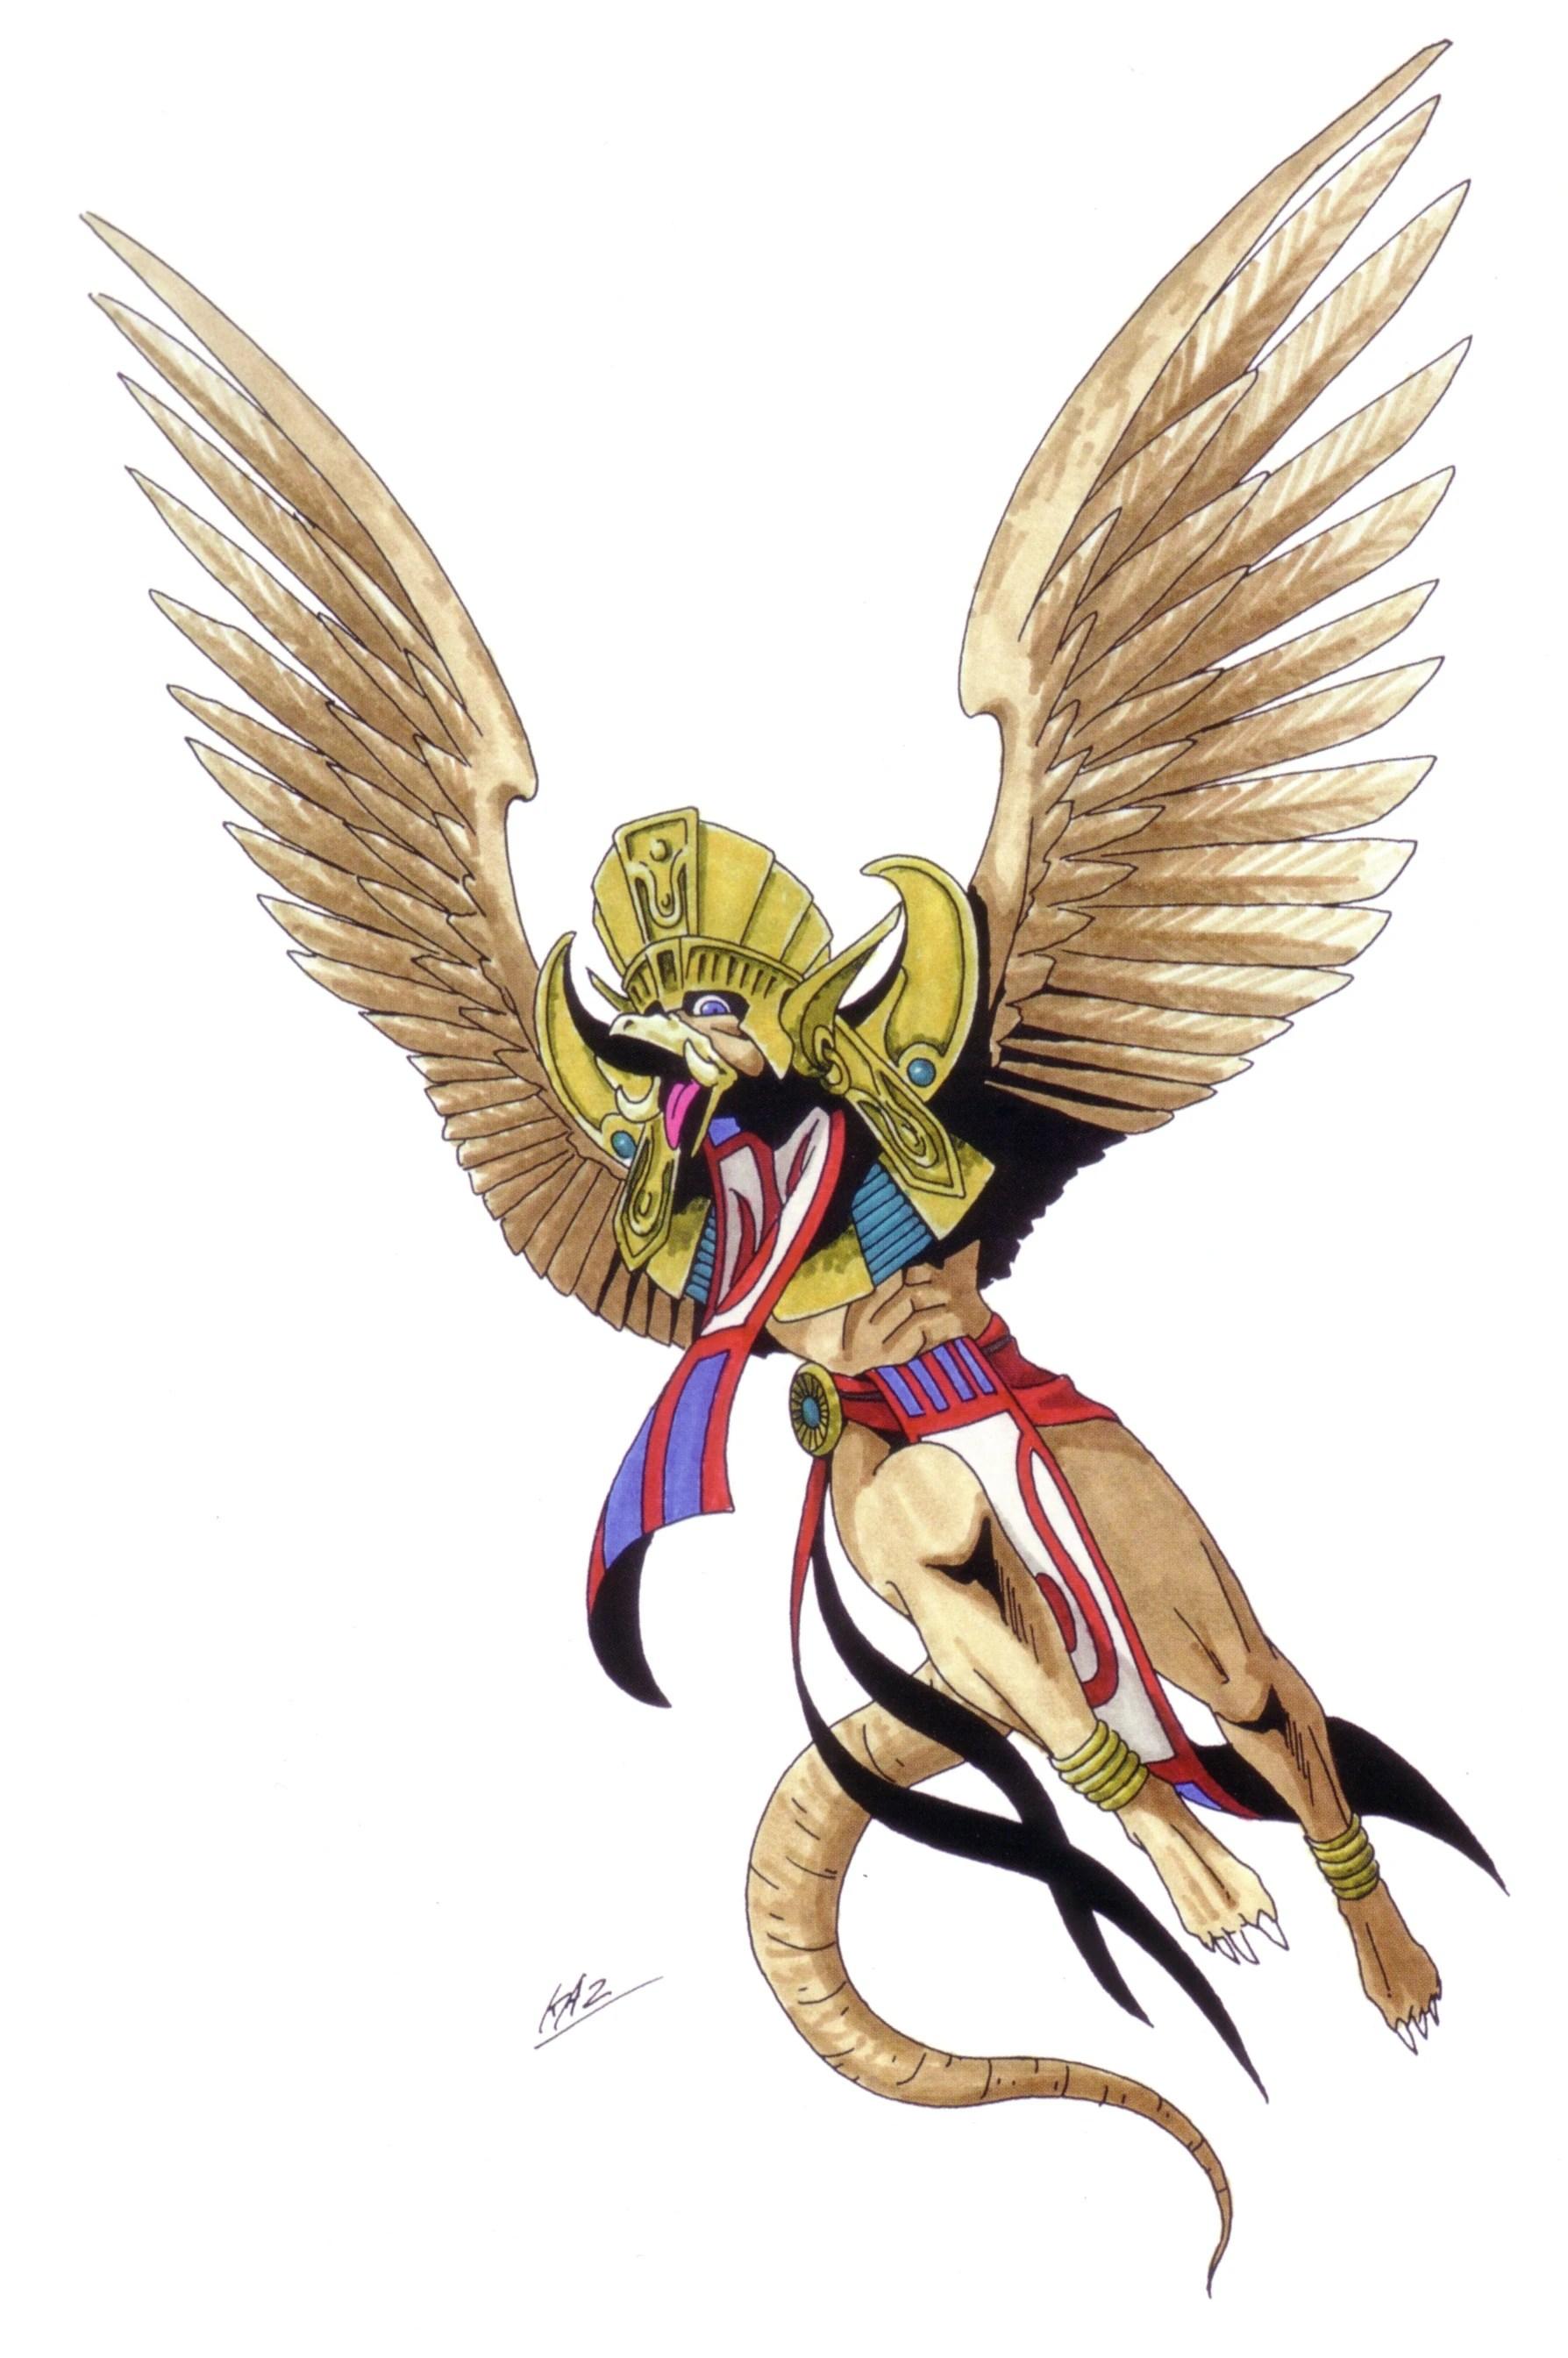 Persona 4 The Animation Wallpaper Garuda Megami Tensei Wiki A Demonic Compendium Of Your